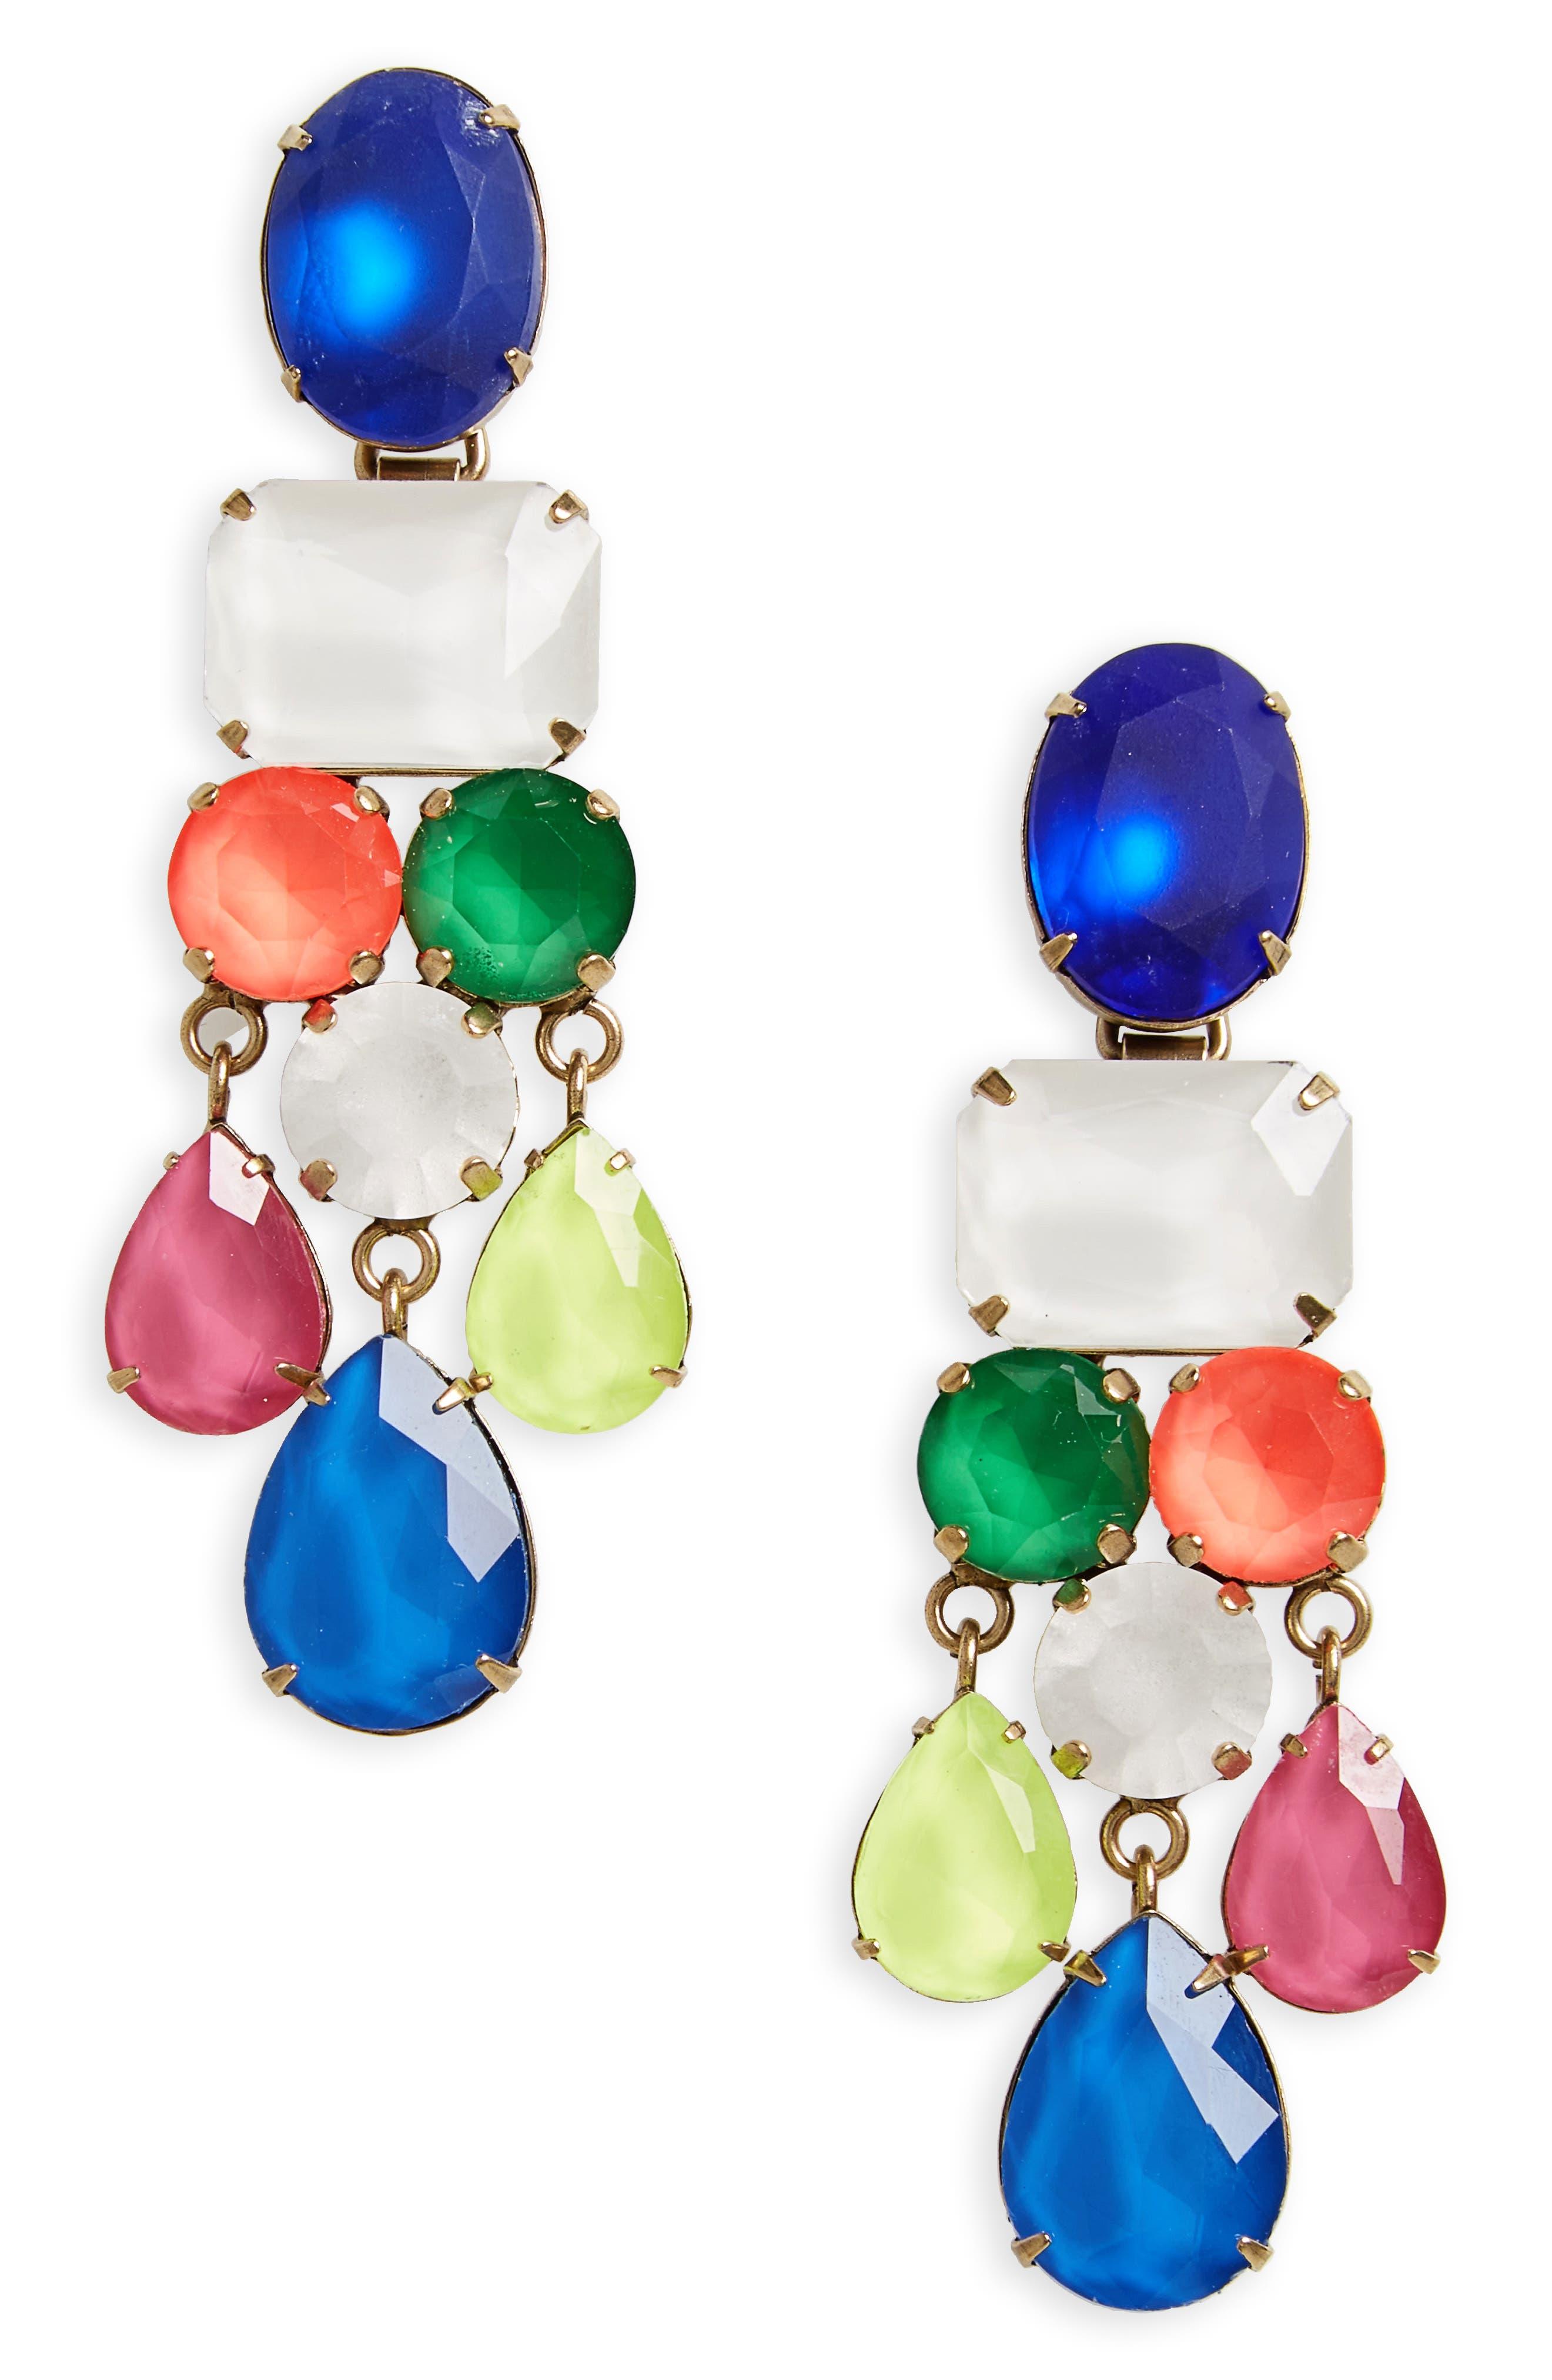 Scarlet Jewel Statement Earrings,                             Main thumbnail 1, color,                             650